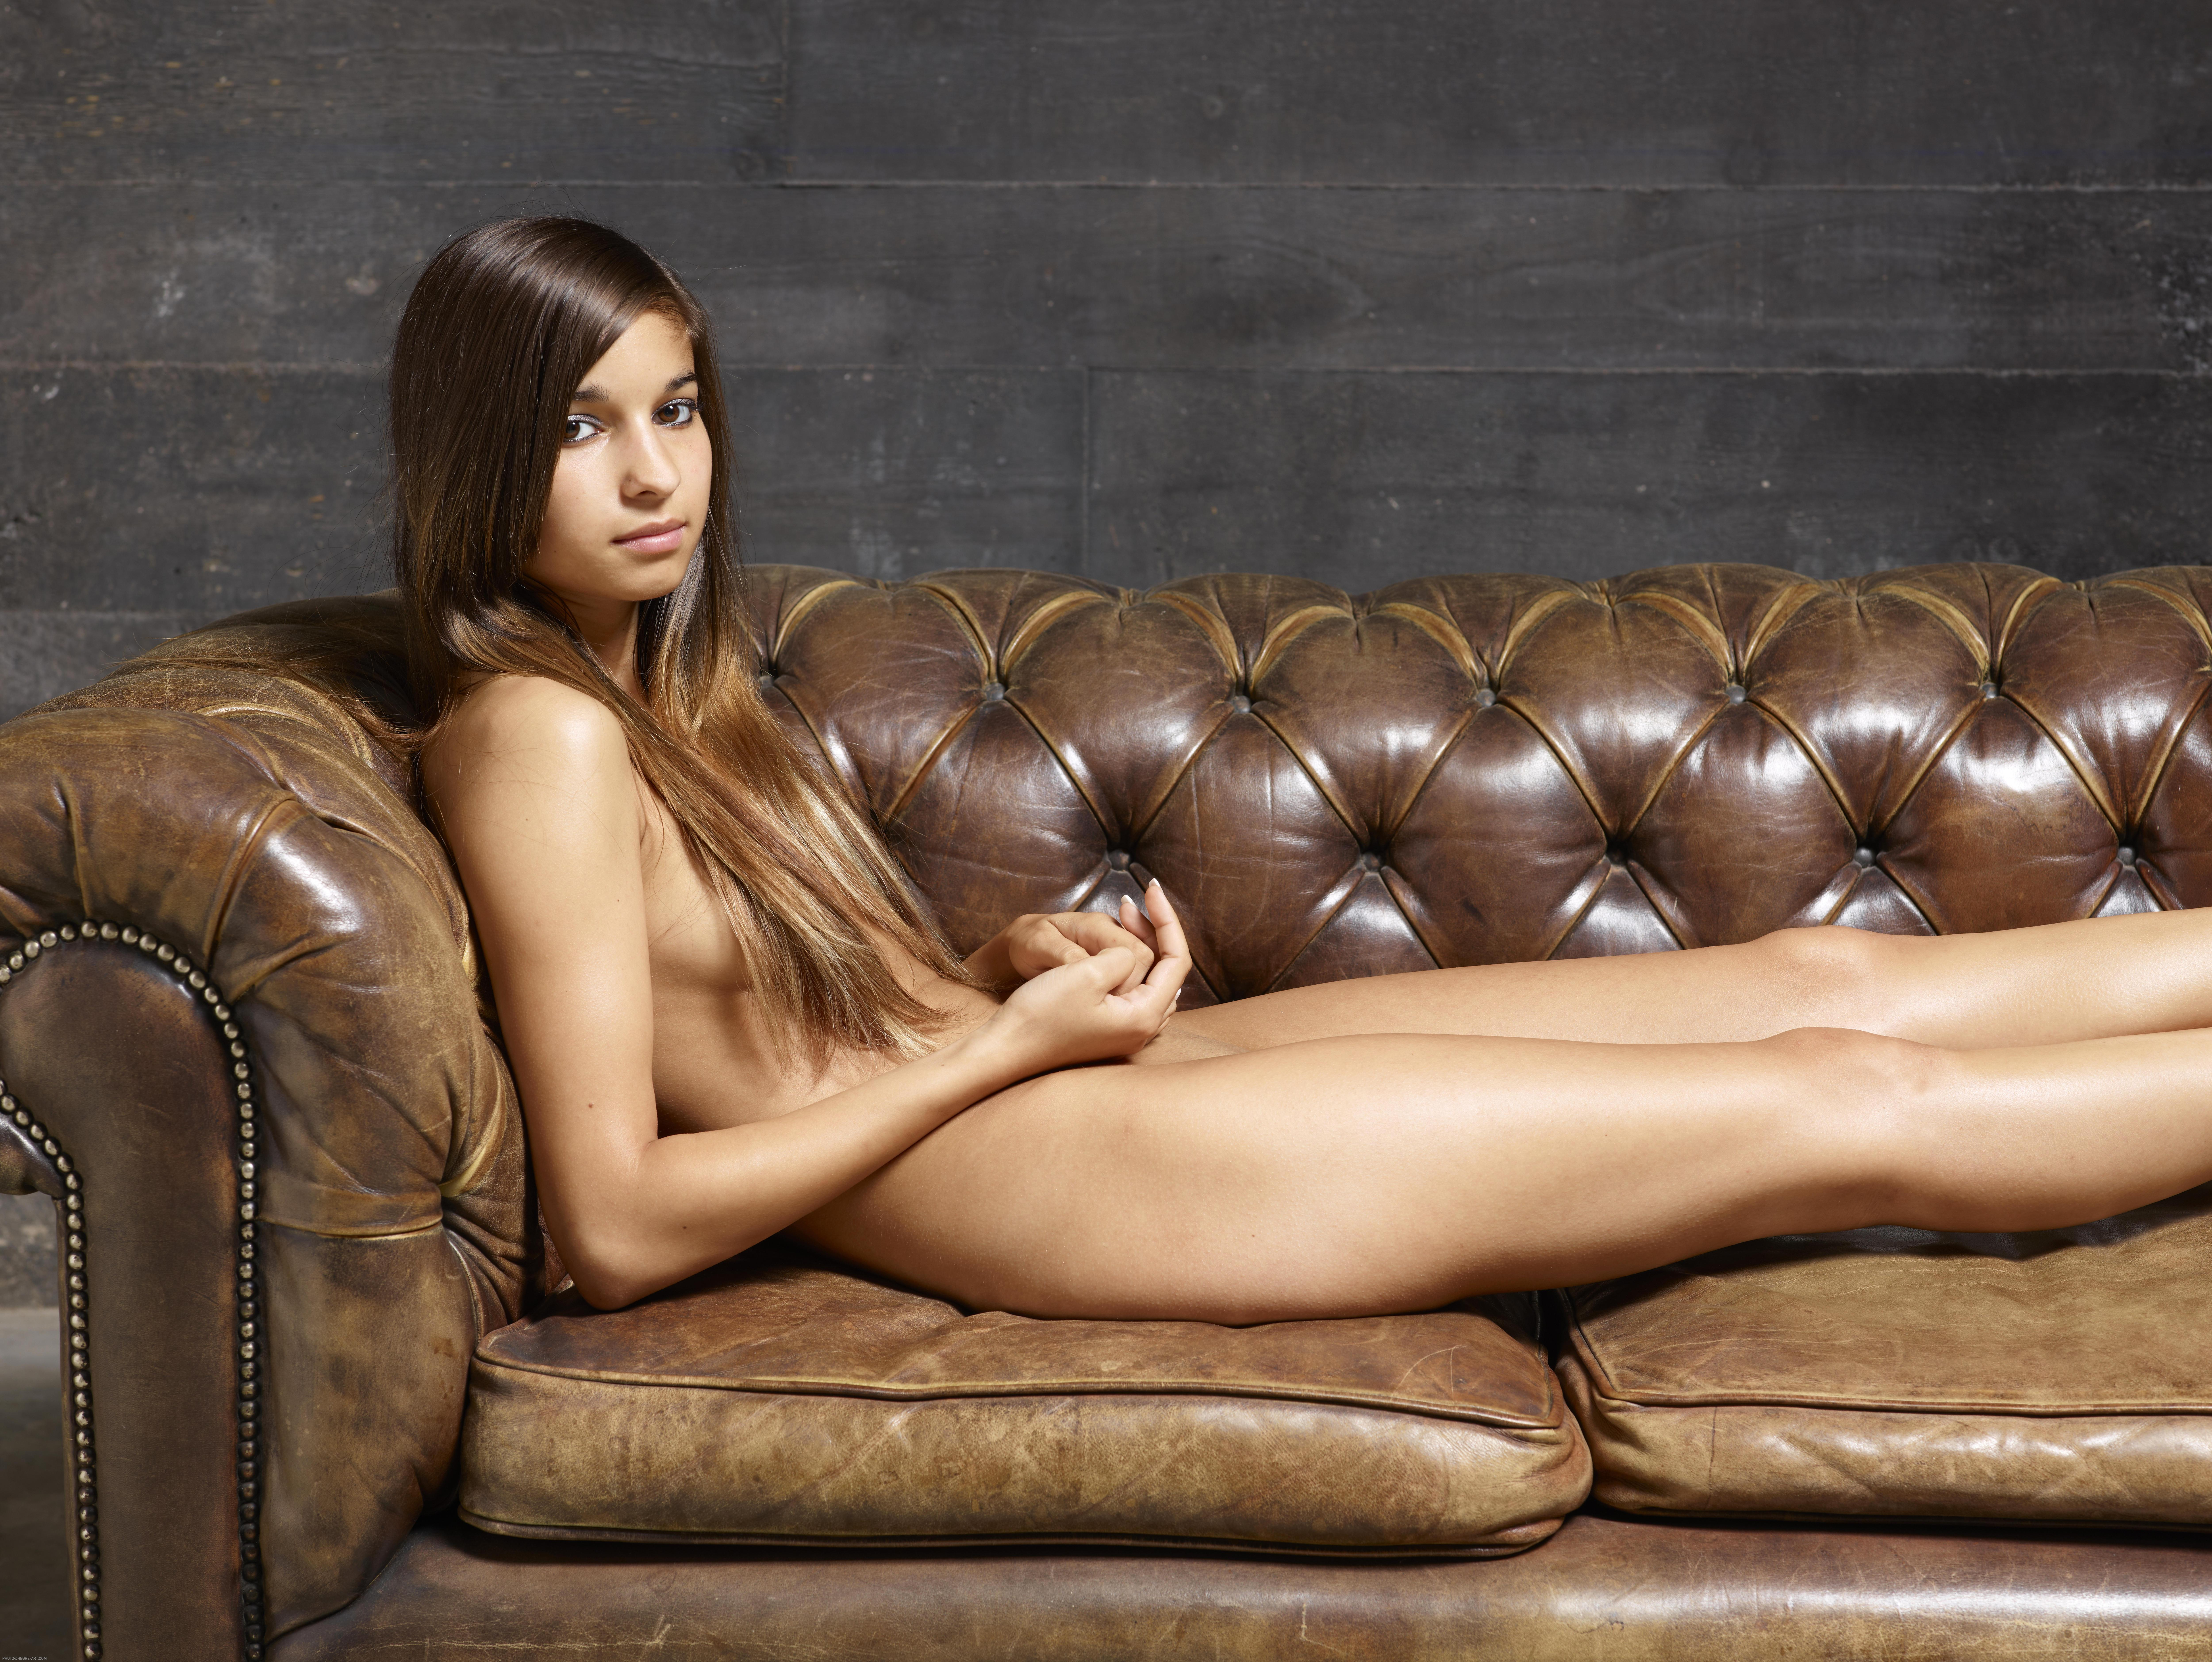 Bd tinni nude sex apologise, but